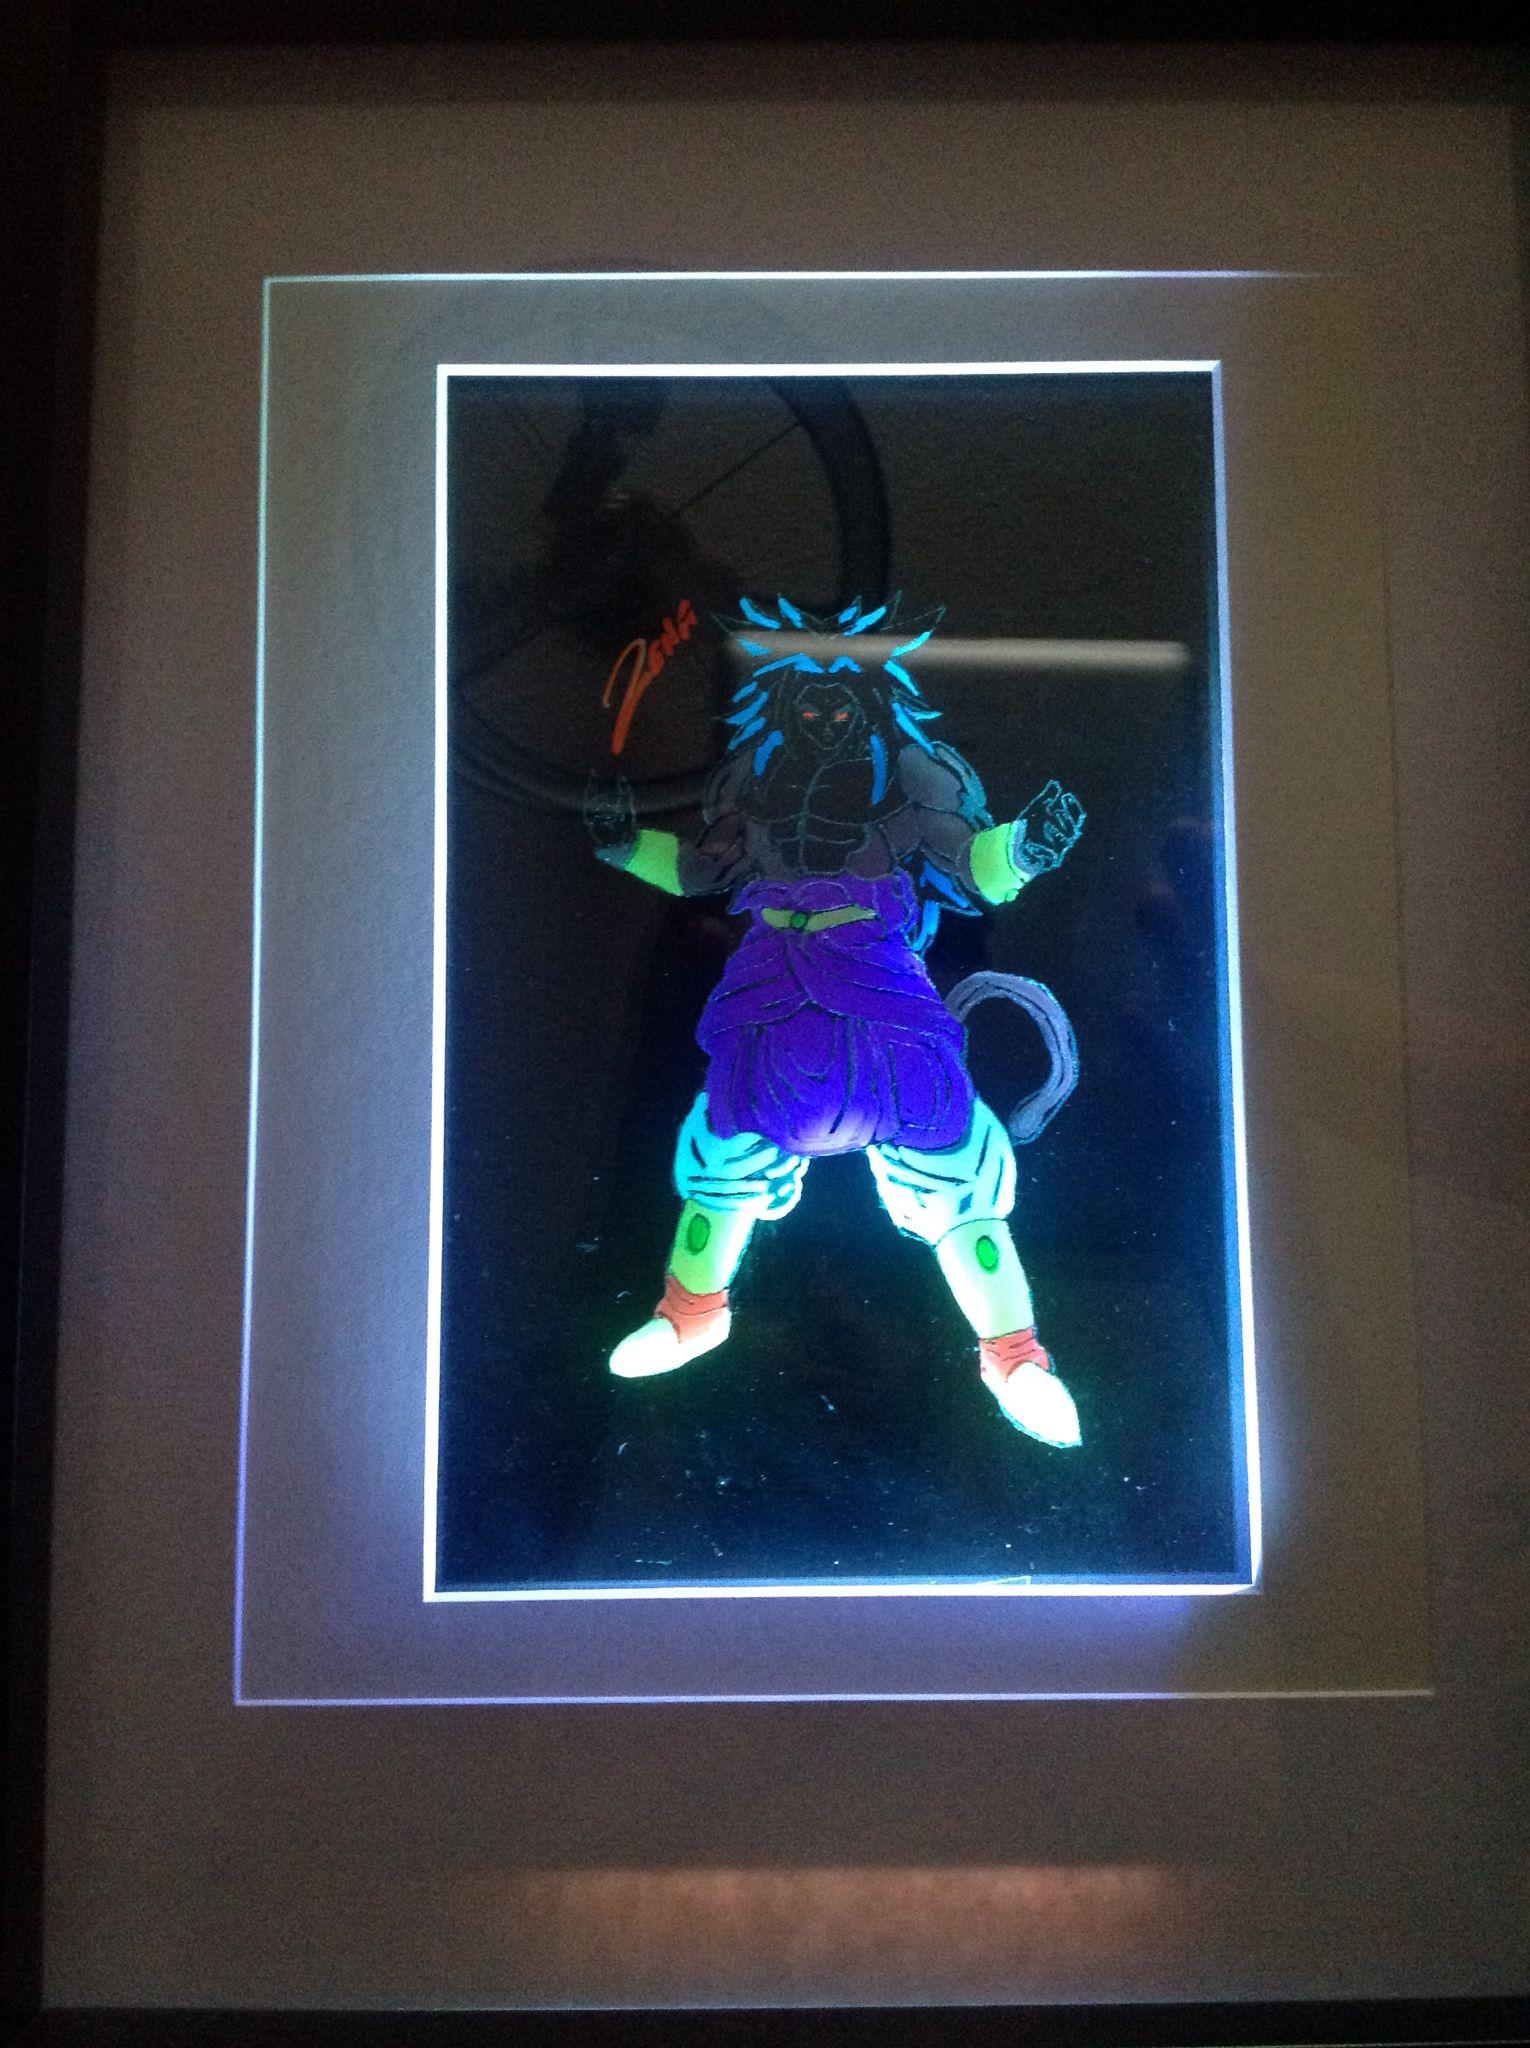 Dragon ball z with images dragon ball z art i love anime